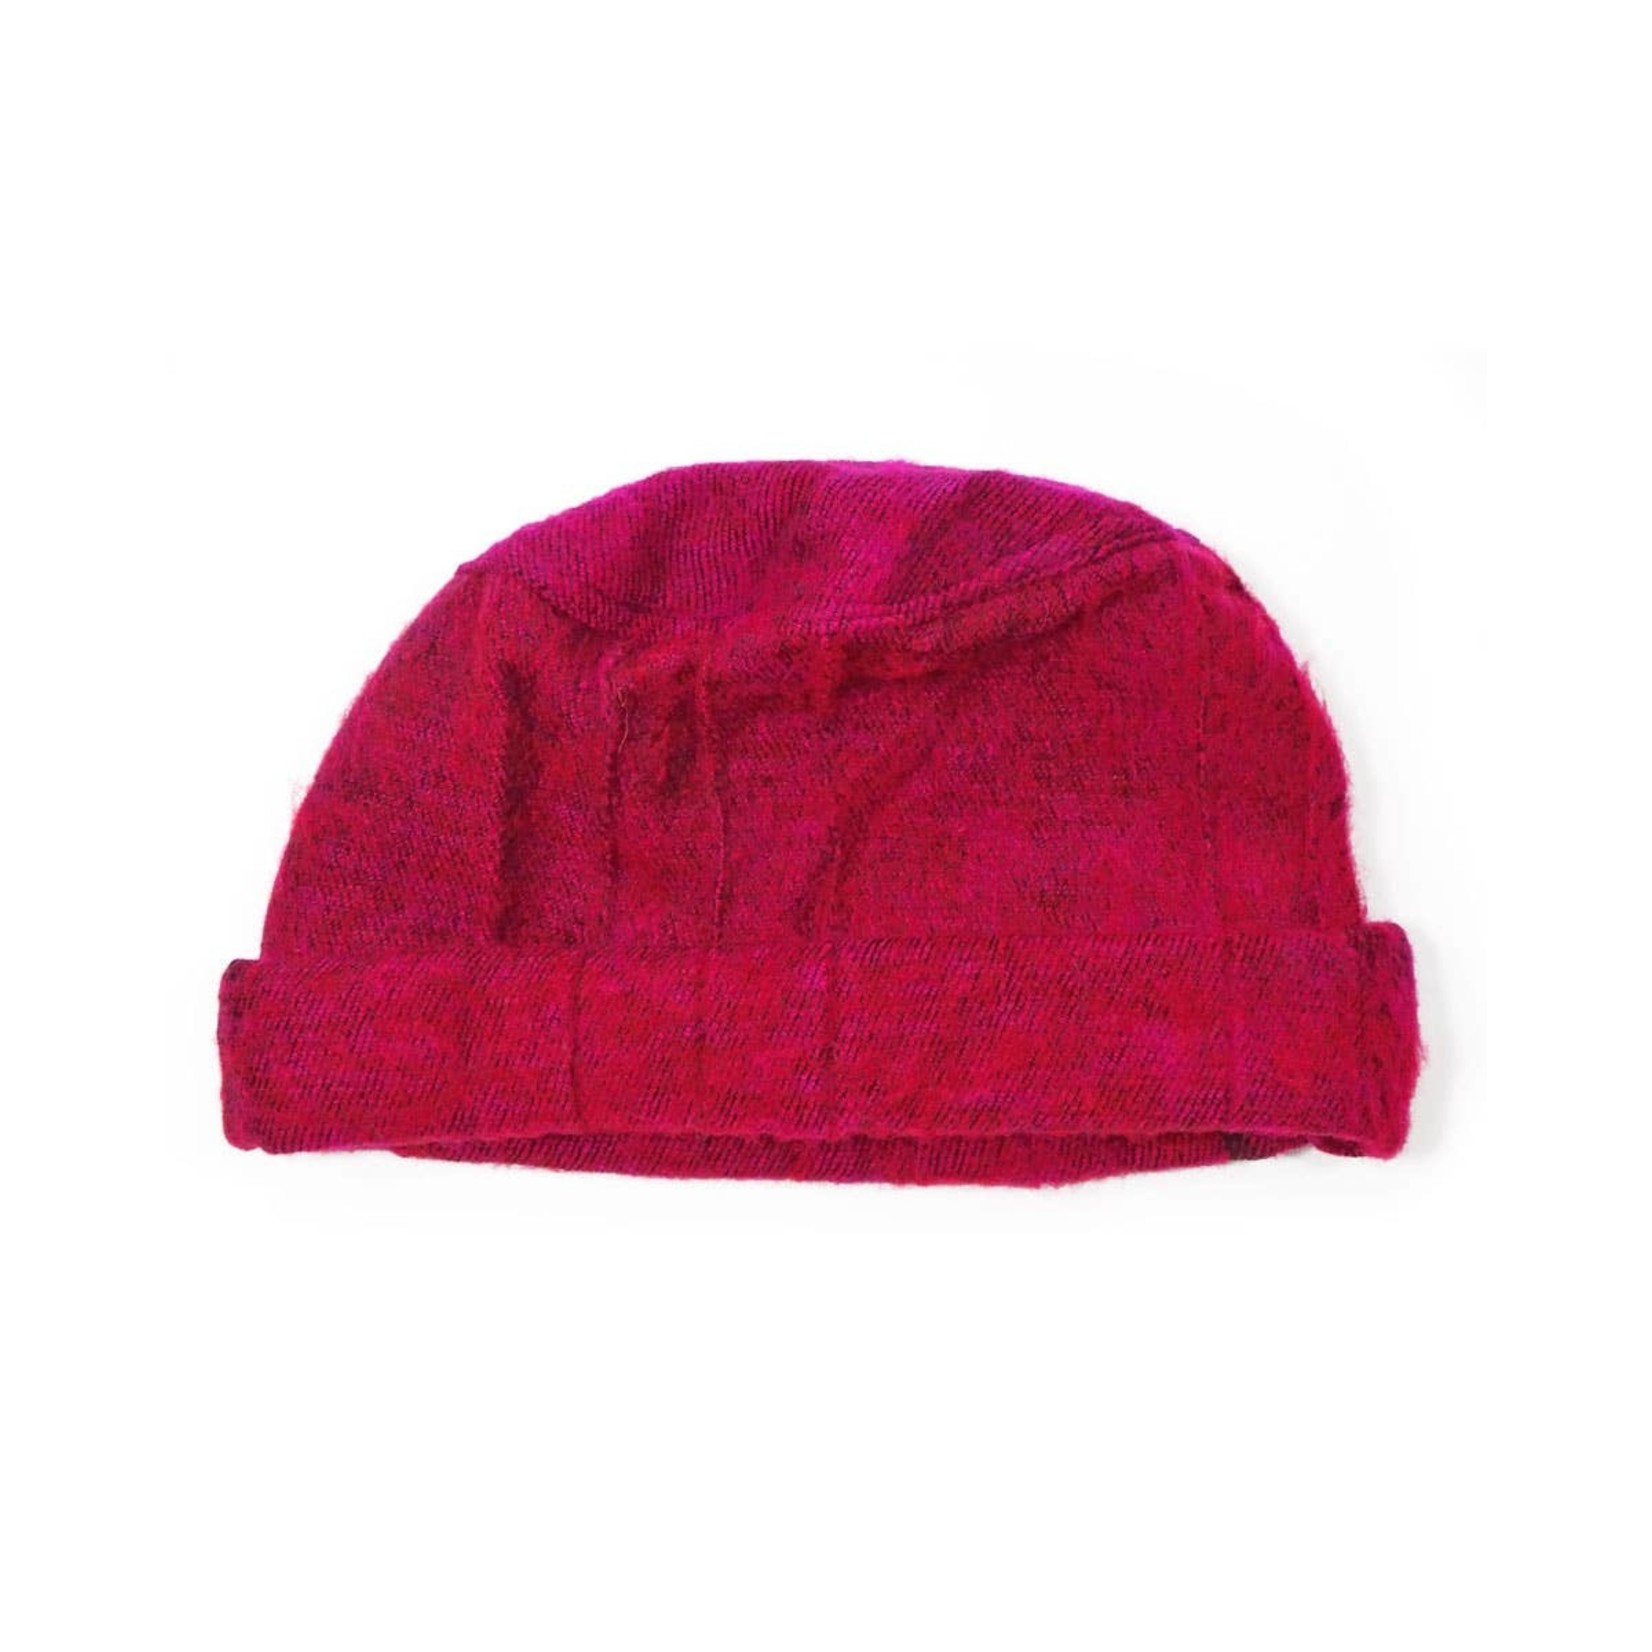 Zig Zag Asian Brushed Woven Pashtun Hat in Raspberry